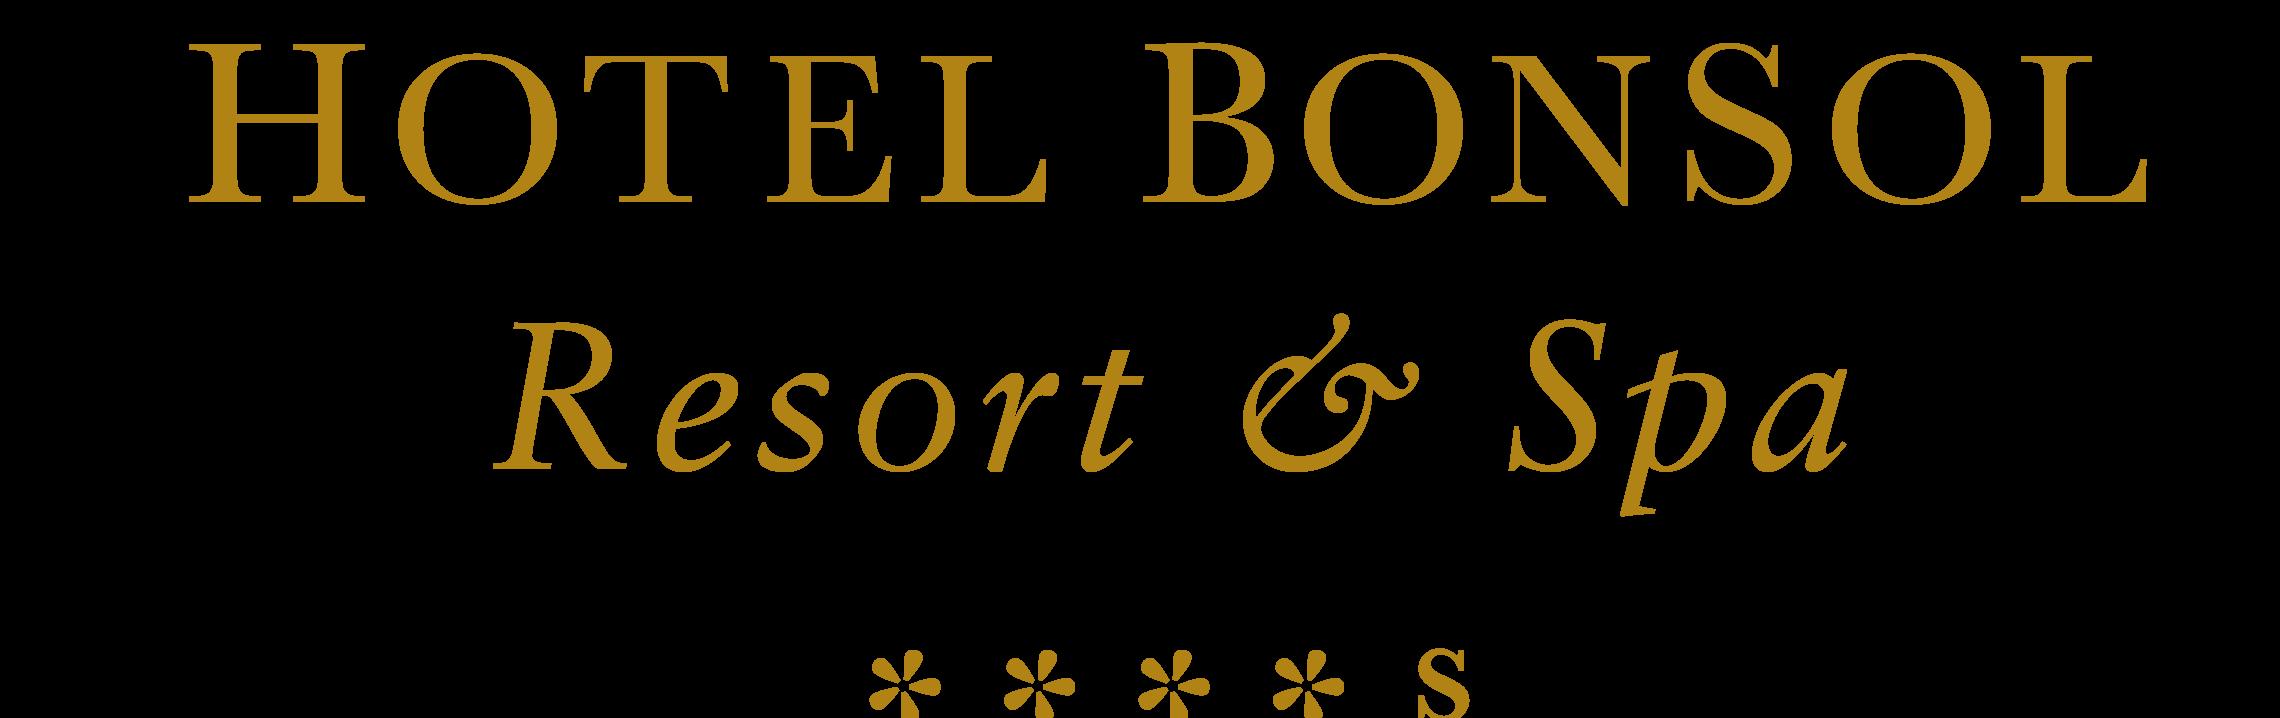 bonsol